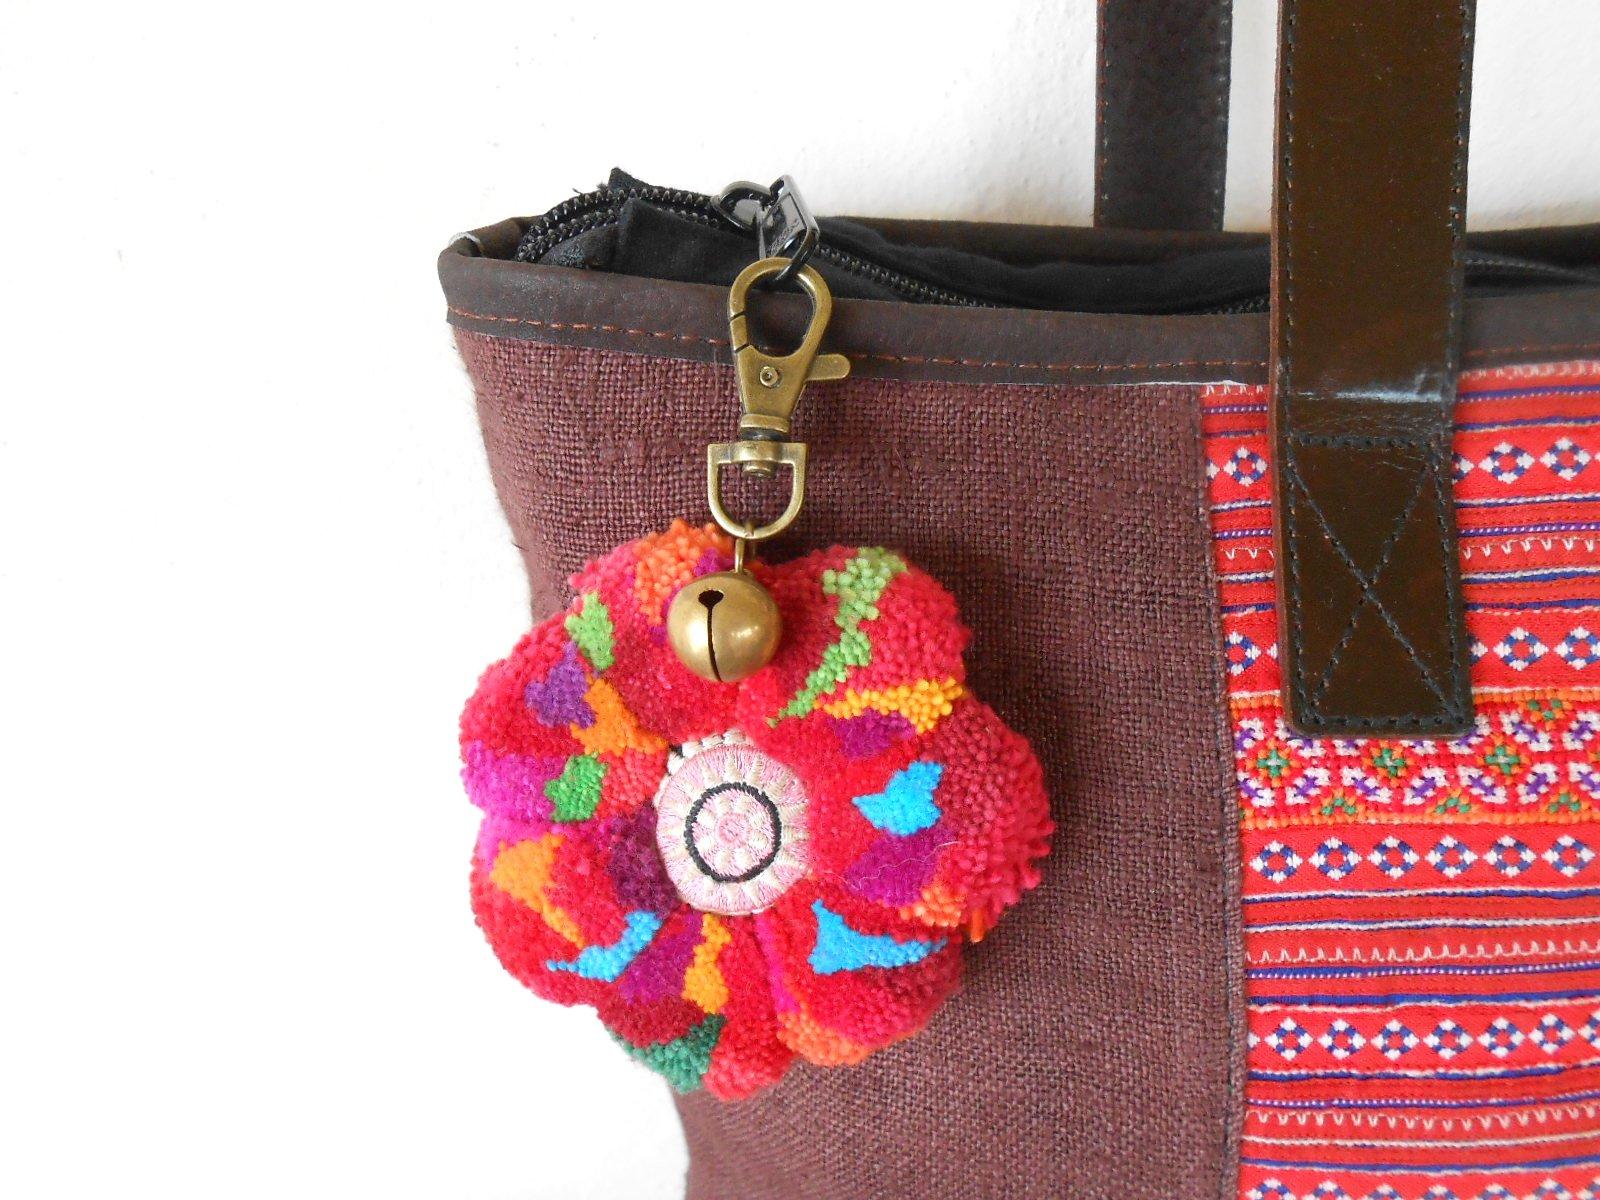 ... Colorful Flower Pom Poms Keychain Zip Pull Bag Accessory Decoration  Handmade AC1002 - Thumbnail 4 b5fe650bd593